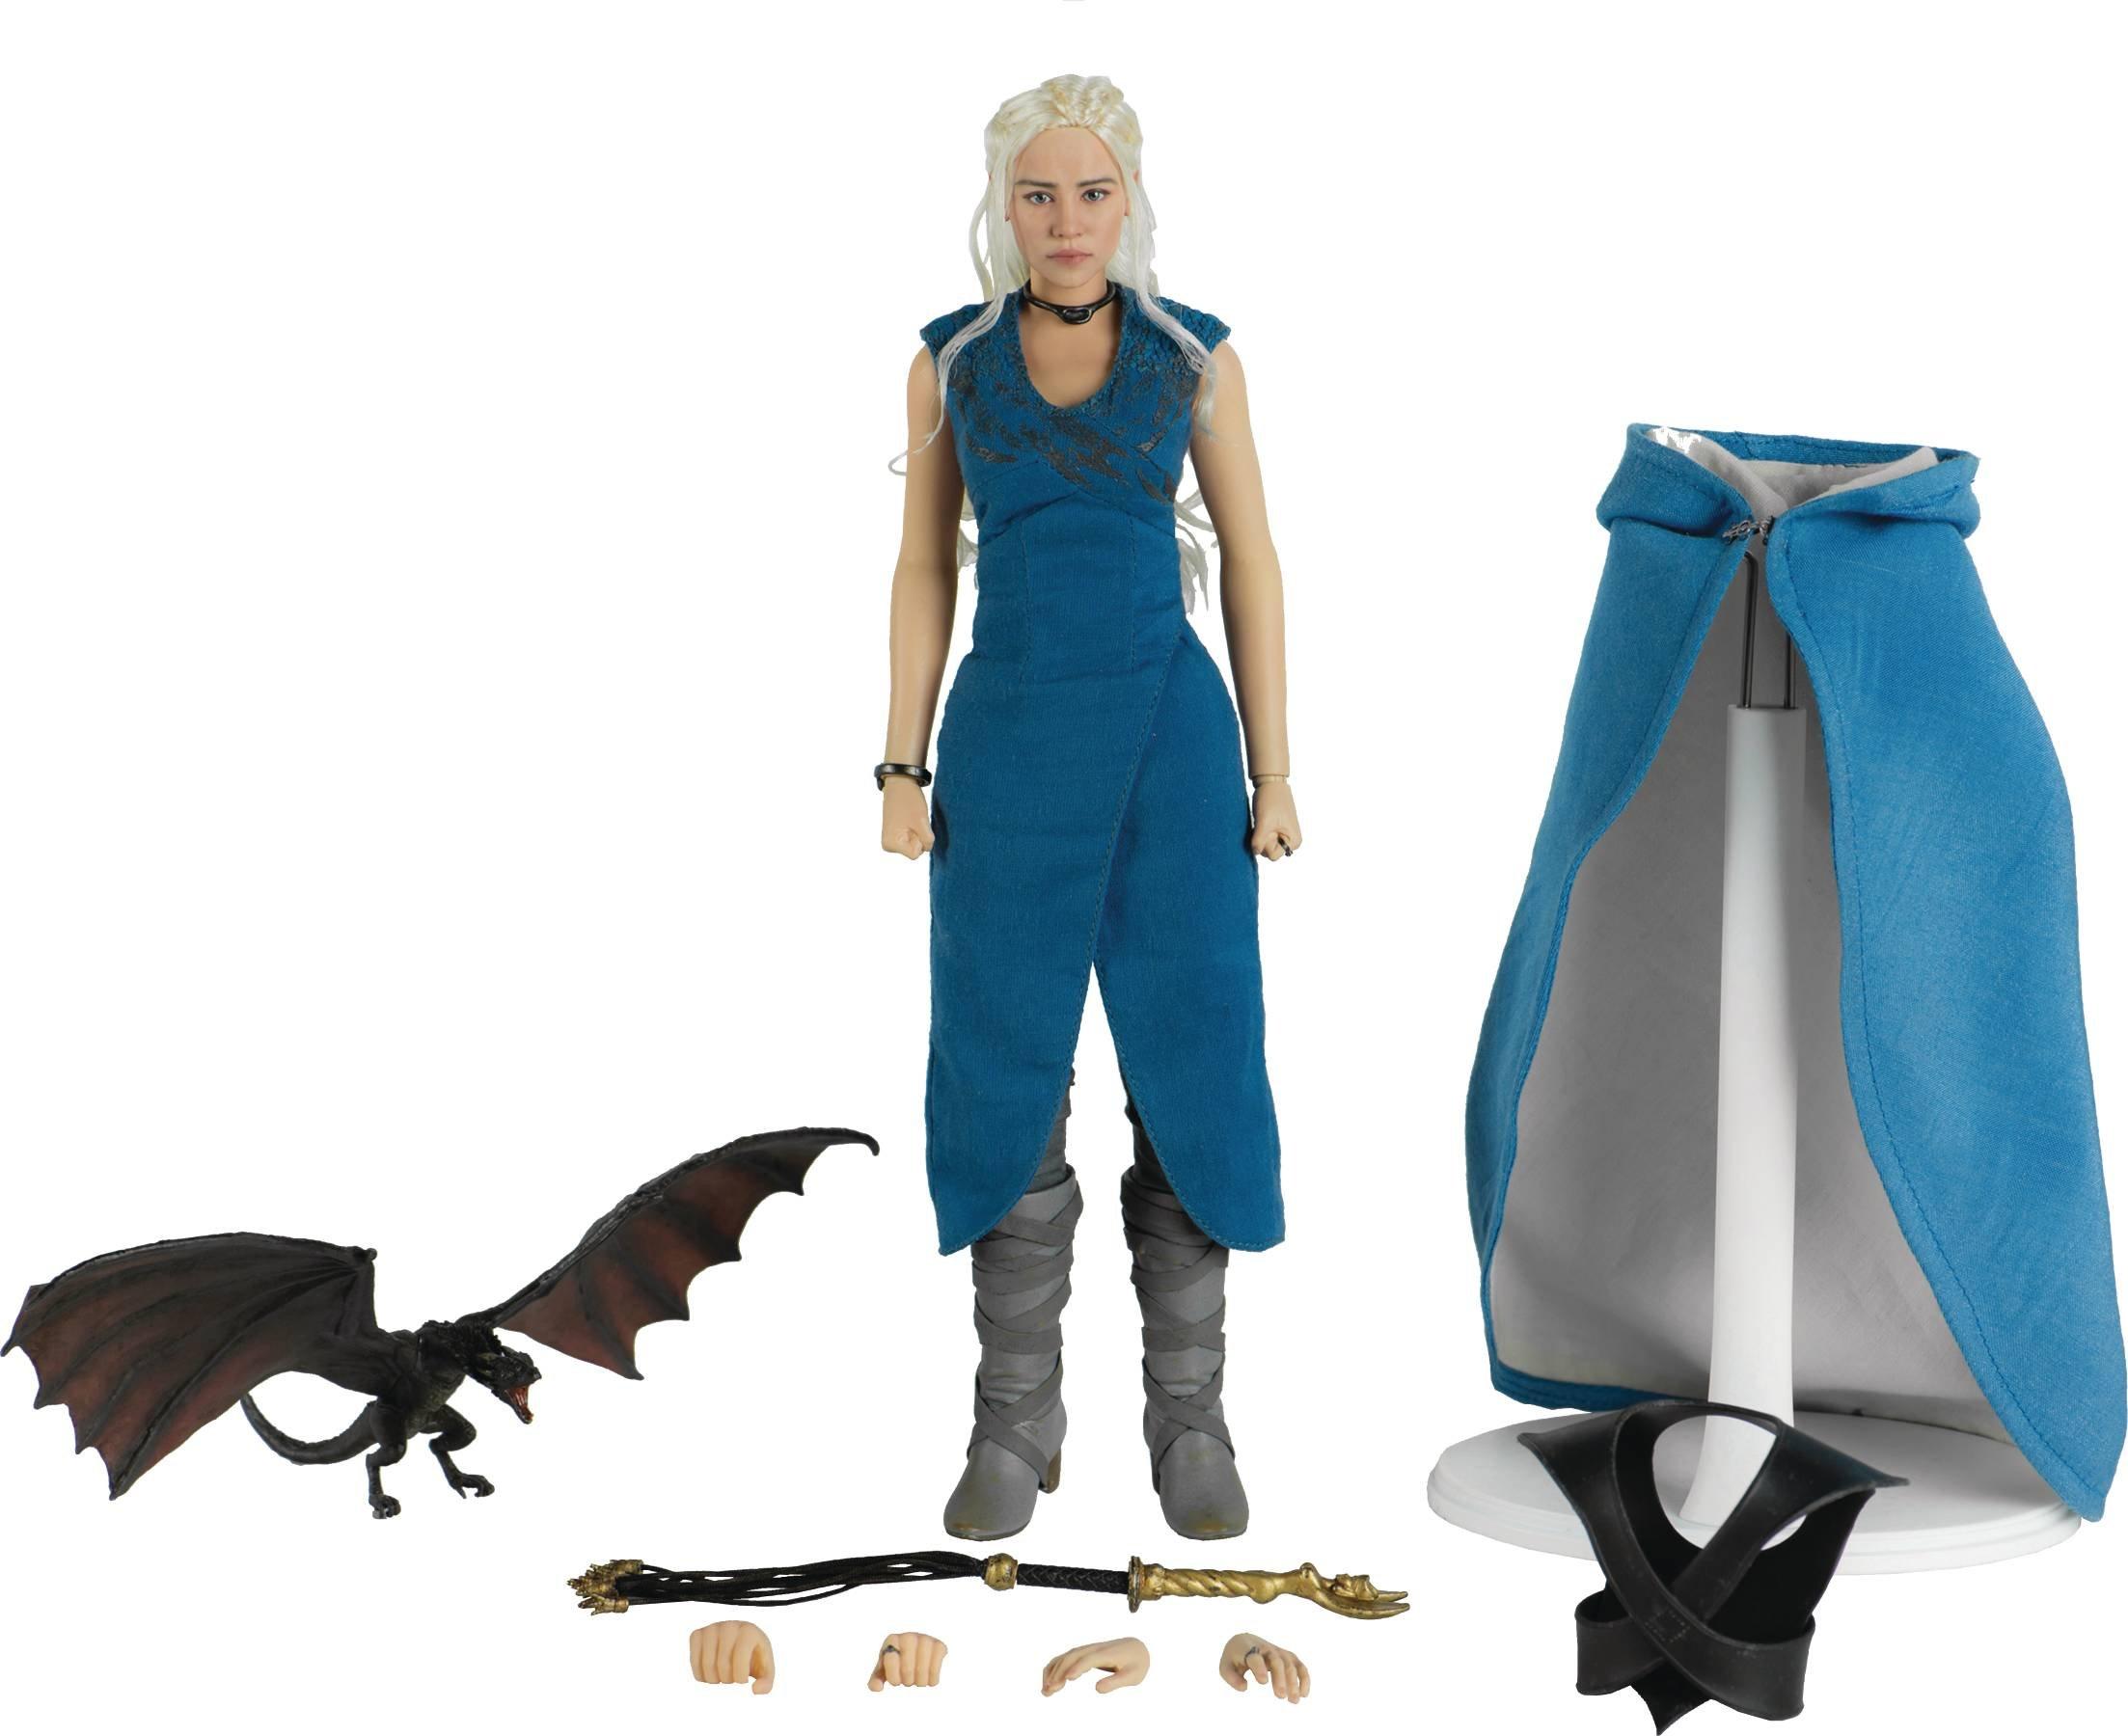 ThreeZero Game of Thrones Daenerys Targaryen 1:6 Scale Action Figure